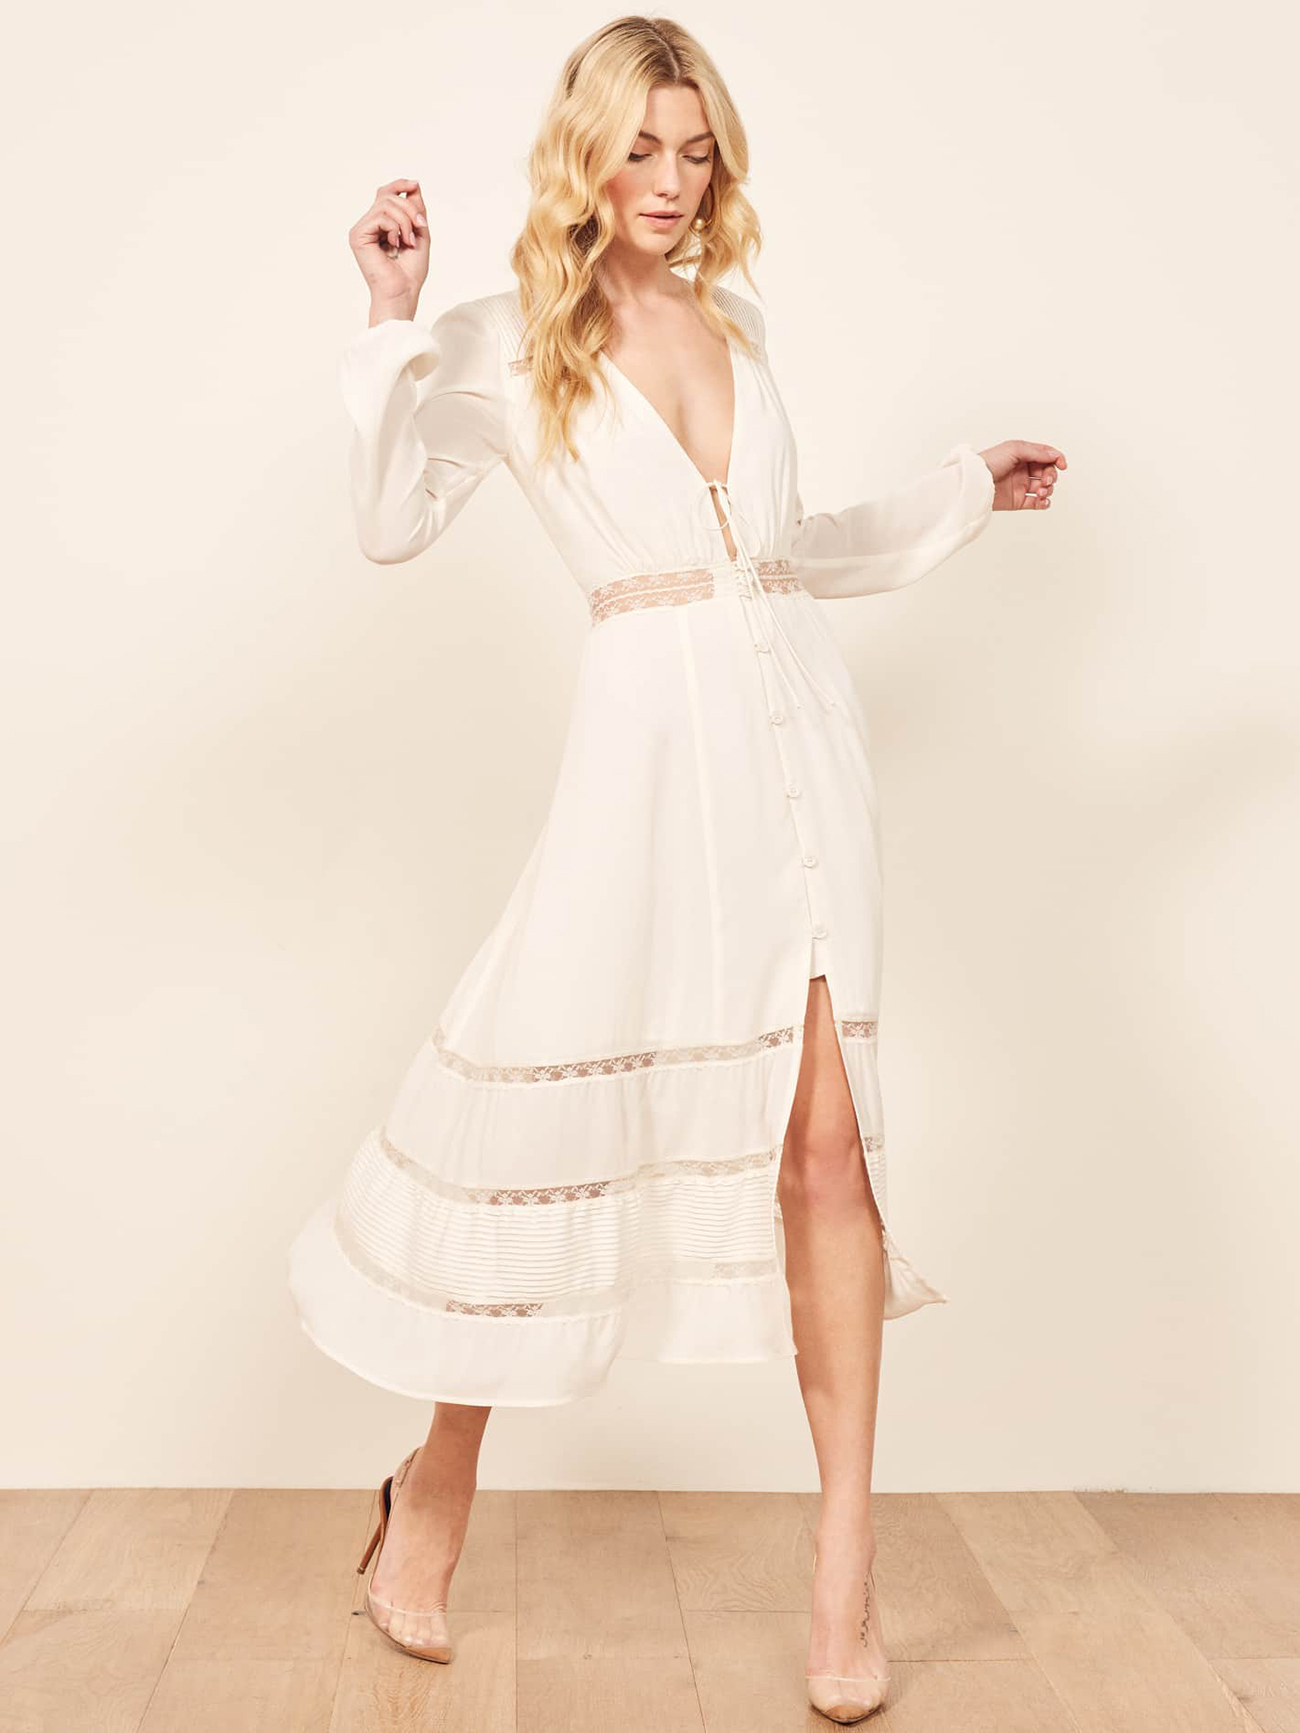 Reformation Modern Minimalistic Wedding Dress Under $800 Budget